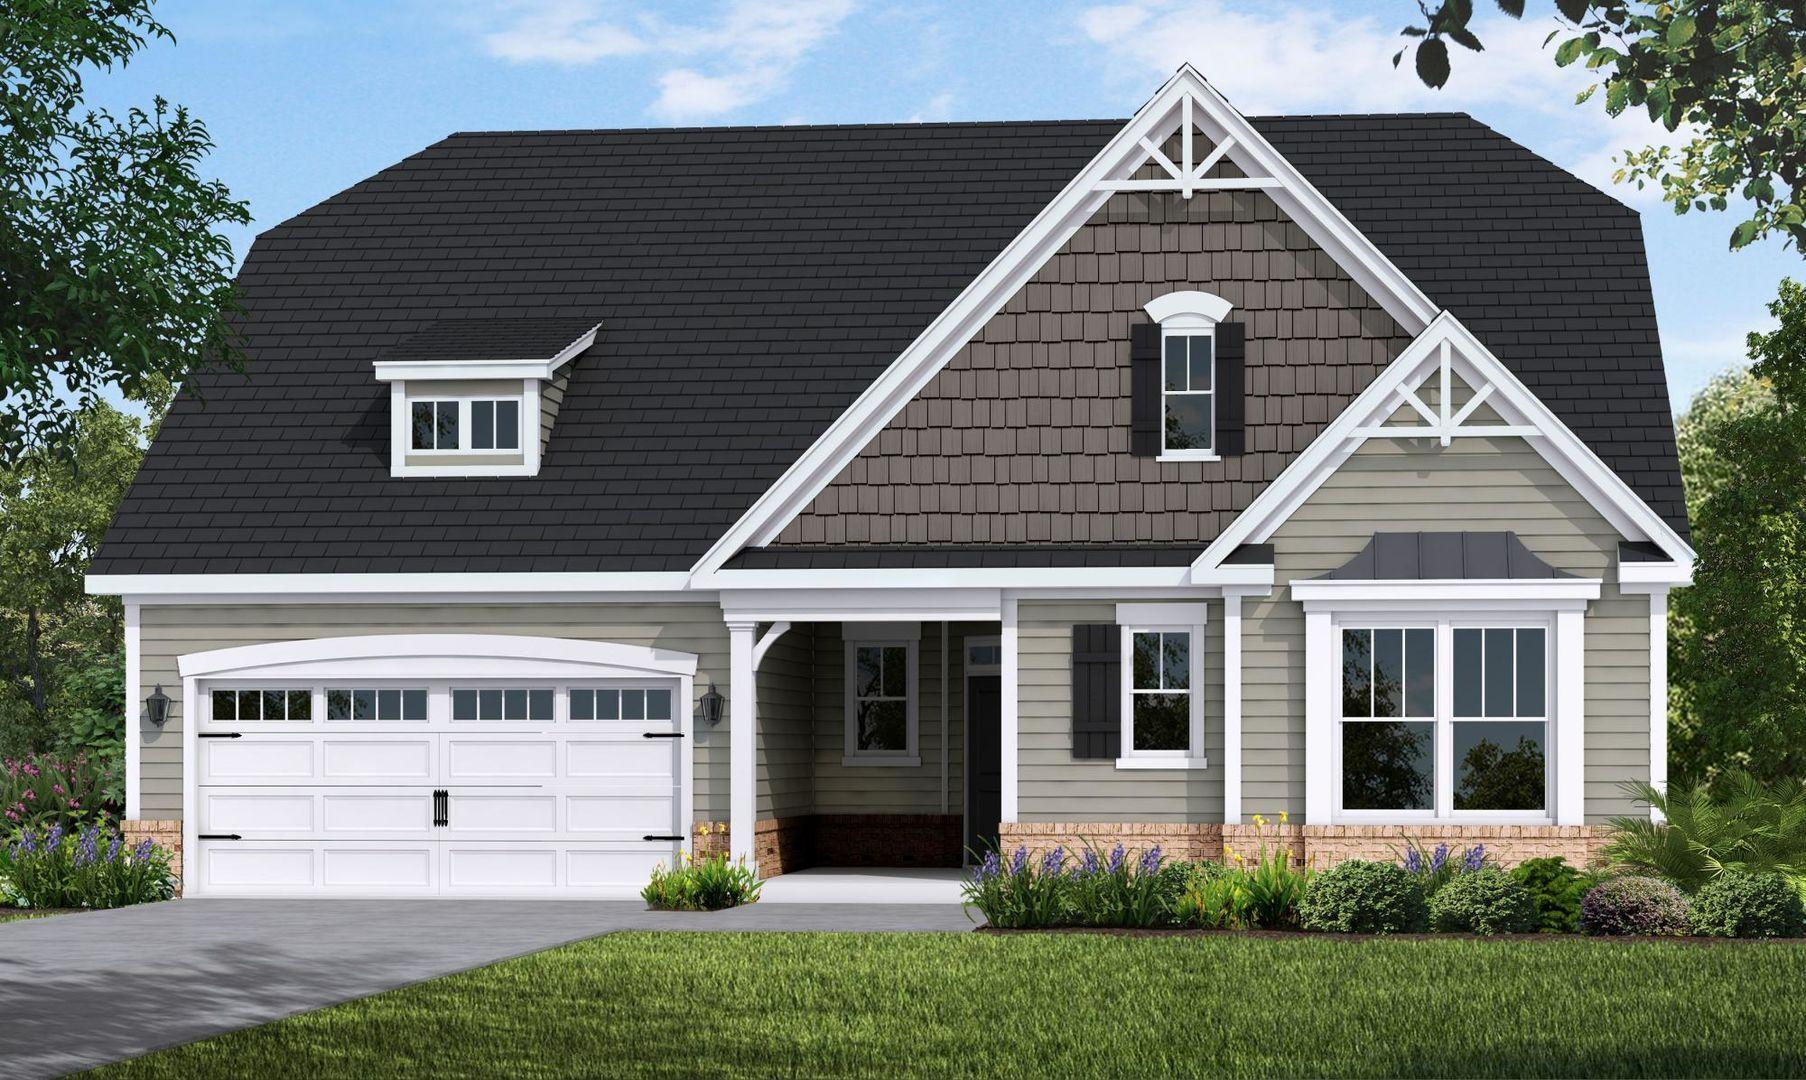 Single Family for Sale at 2034 Lindrick Court Nw Calabash, North Carolina 28467 United States